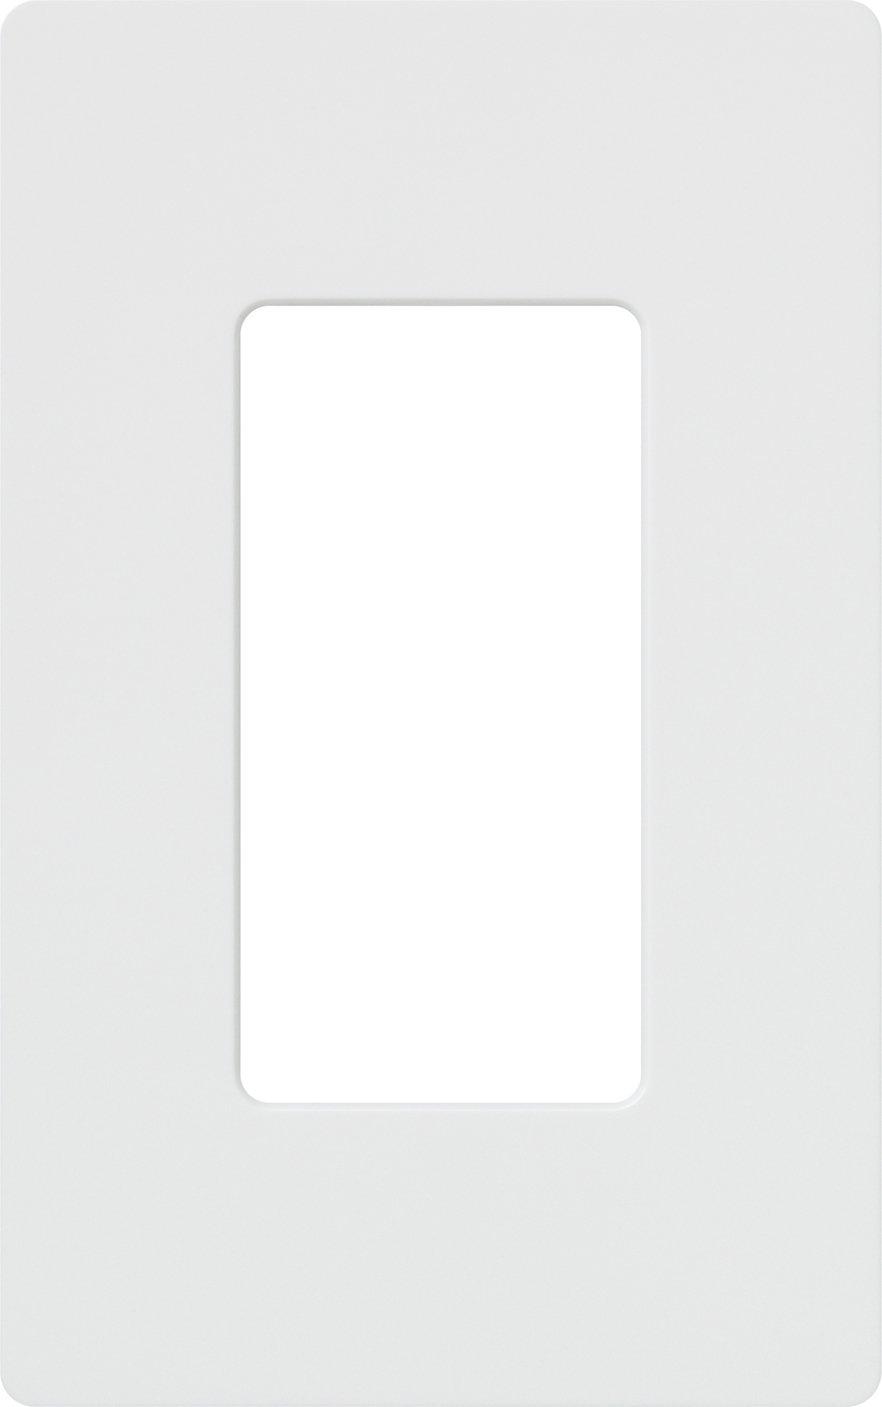 Lutron CW-1-WH-96 Claro 1-Gang Wallplate (96 Pack), White by Lutron B000MAXBOU